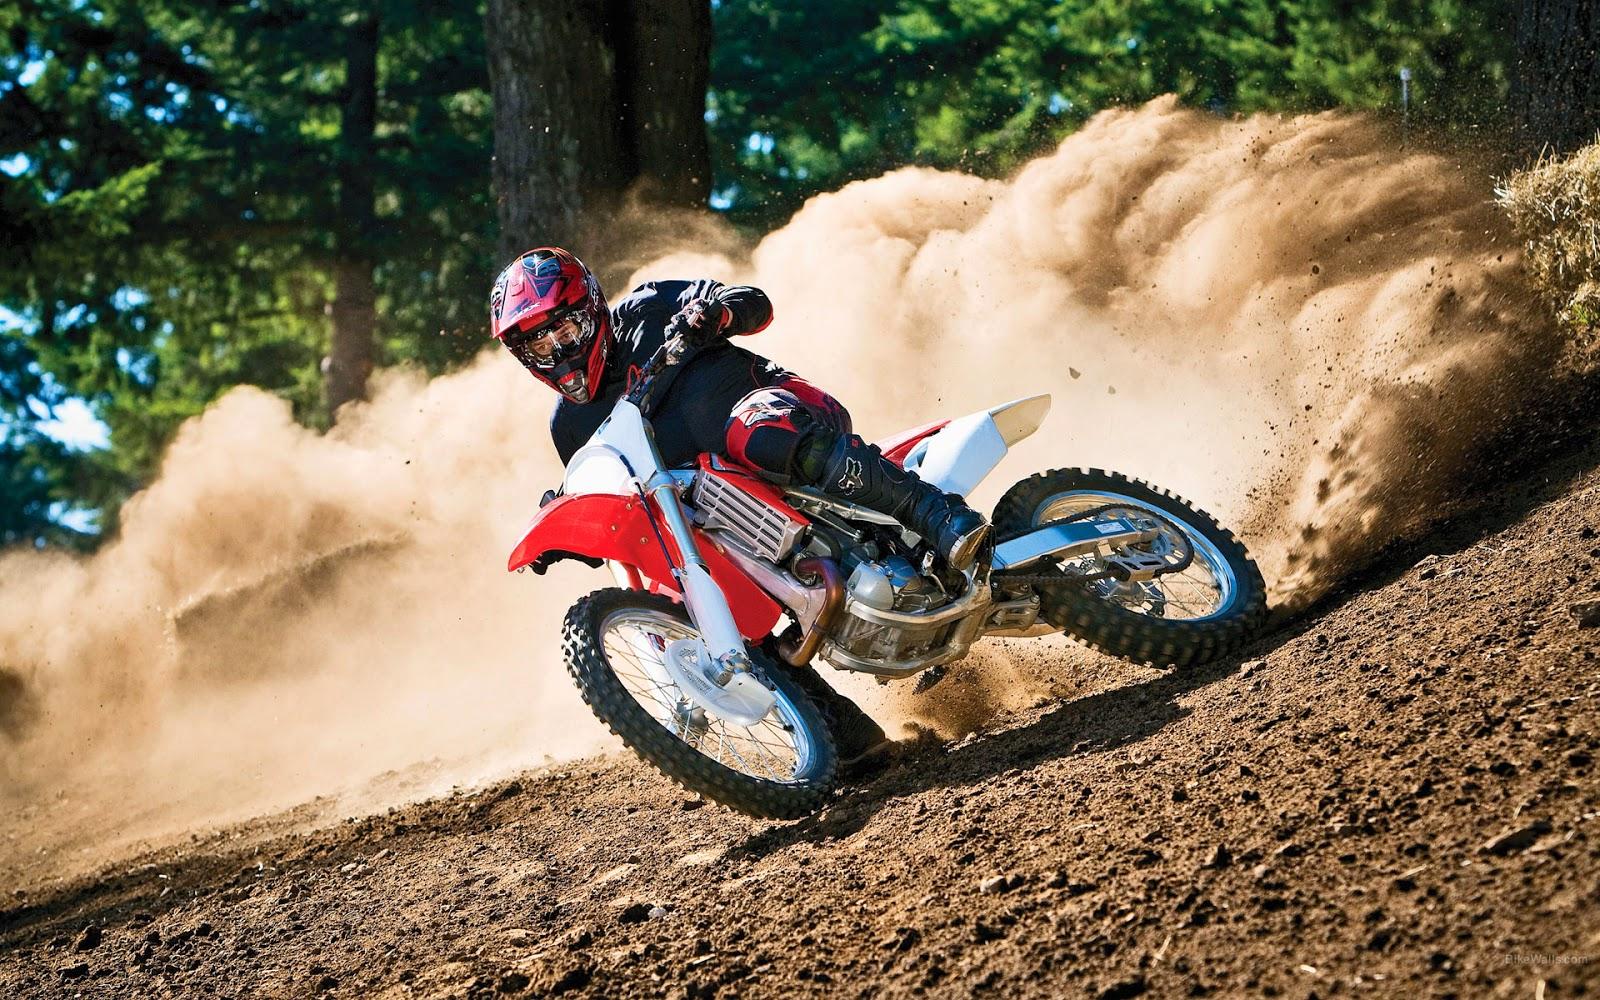 Honda CRF 450R Motorcycle Images